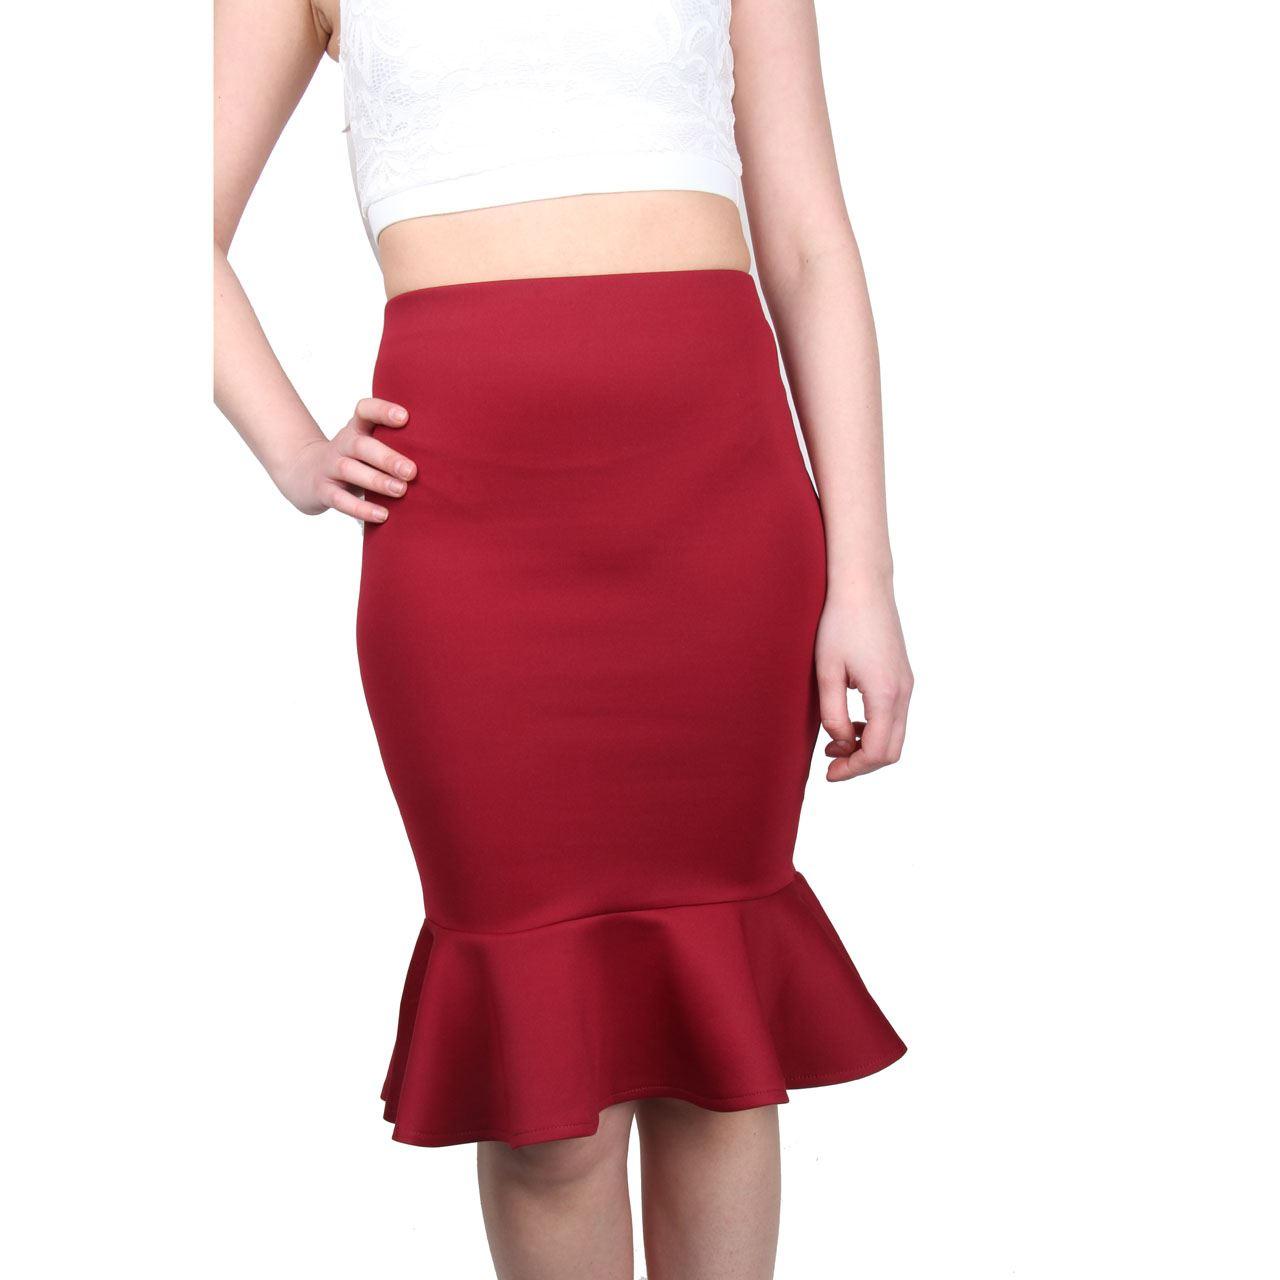 Cool Tutu Skirts Womens Midi Tulle Skirt Women Gauze High Waist Skirt